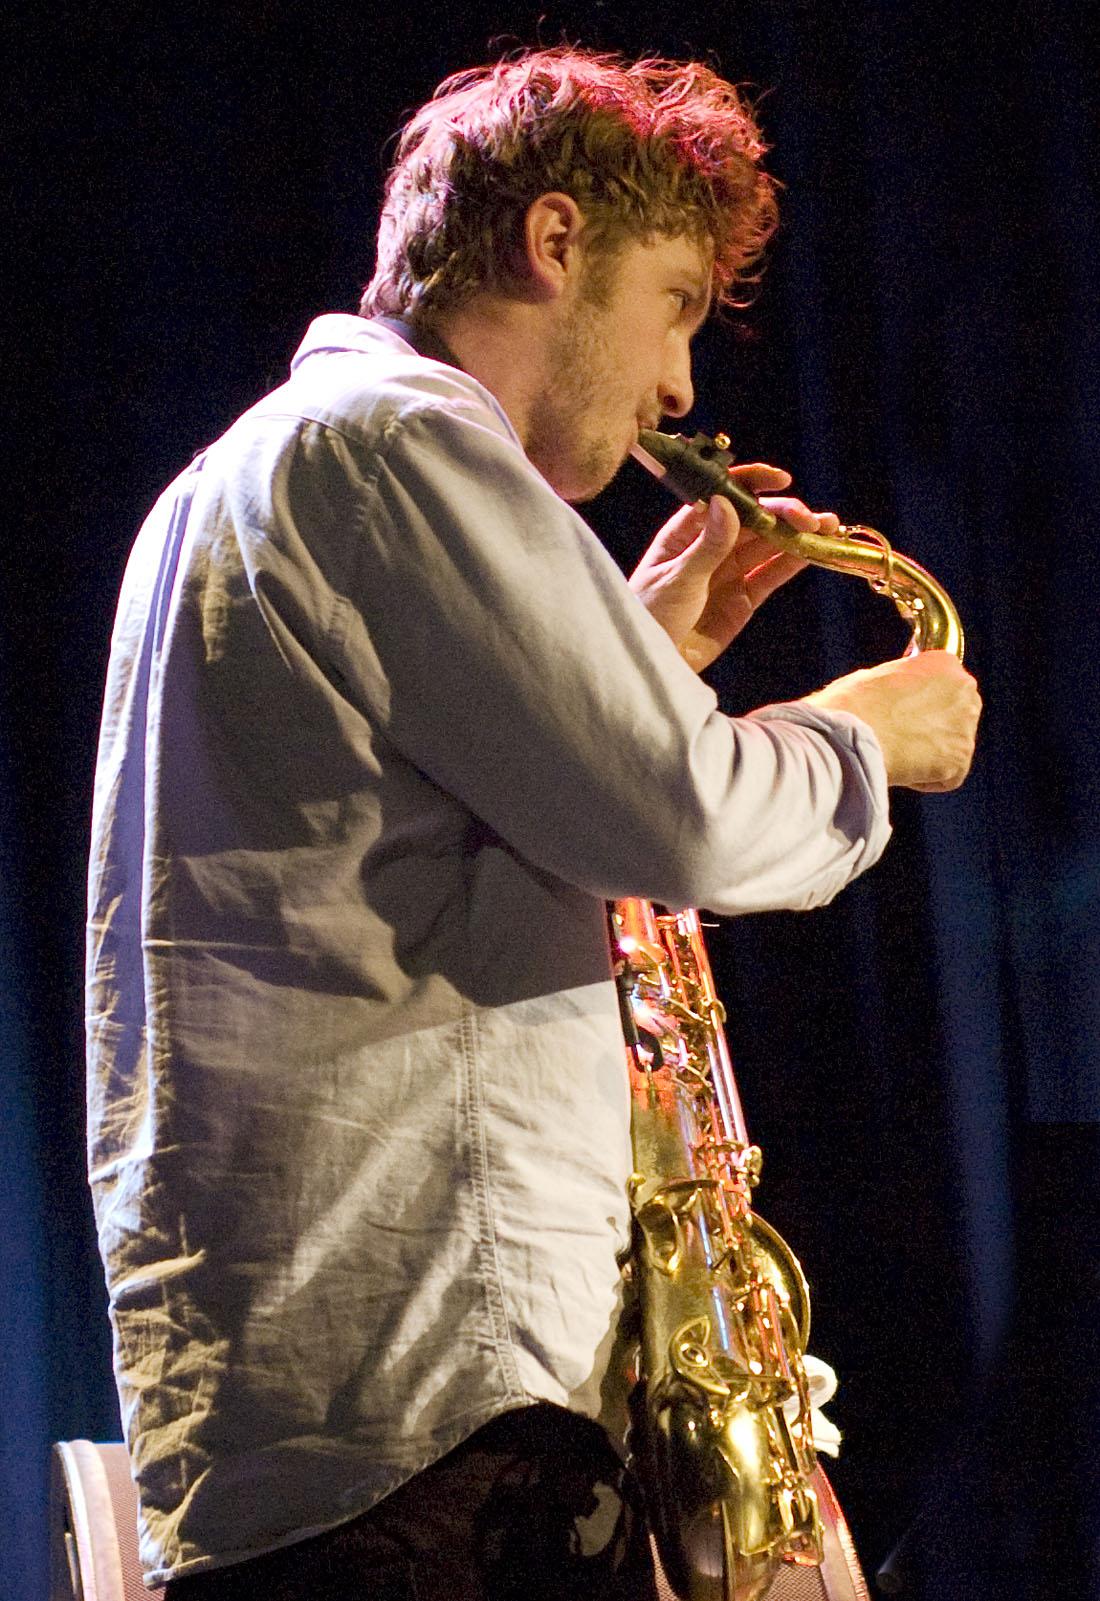 Jack Wyllie of Portico Quartet, L'Astral, Montreal, Canada 10/02/2010